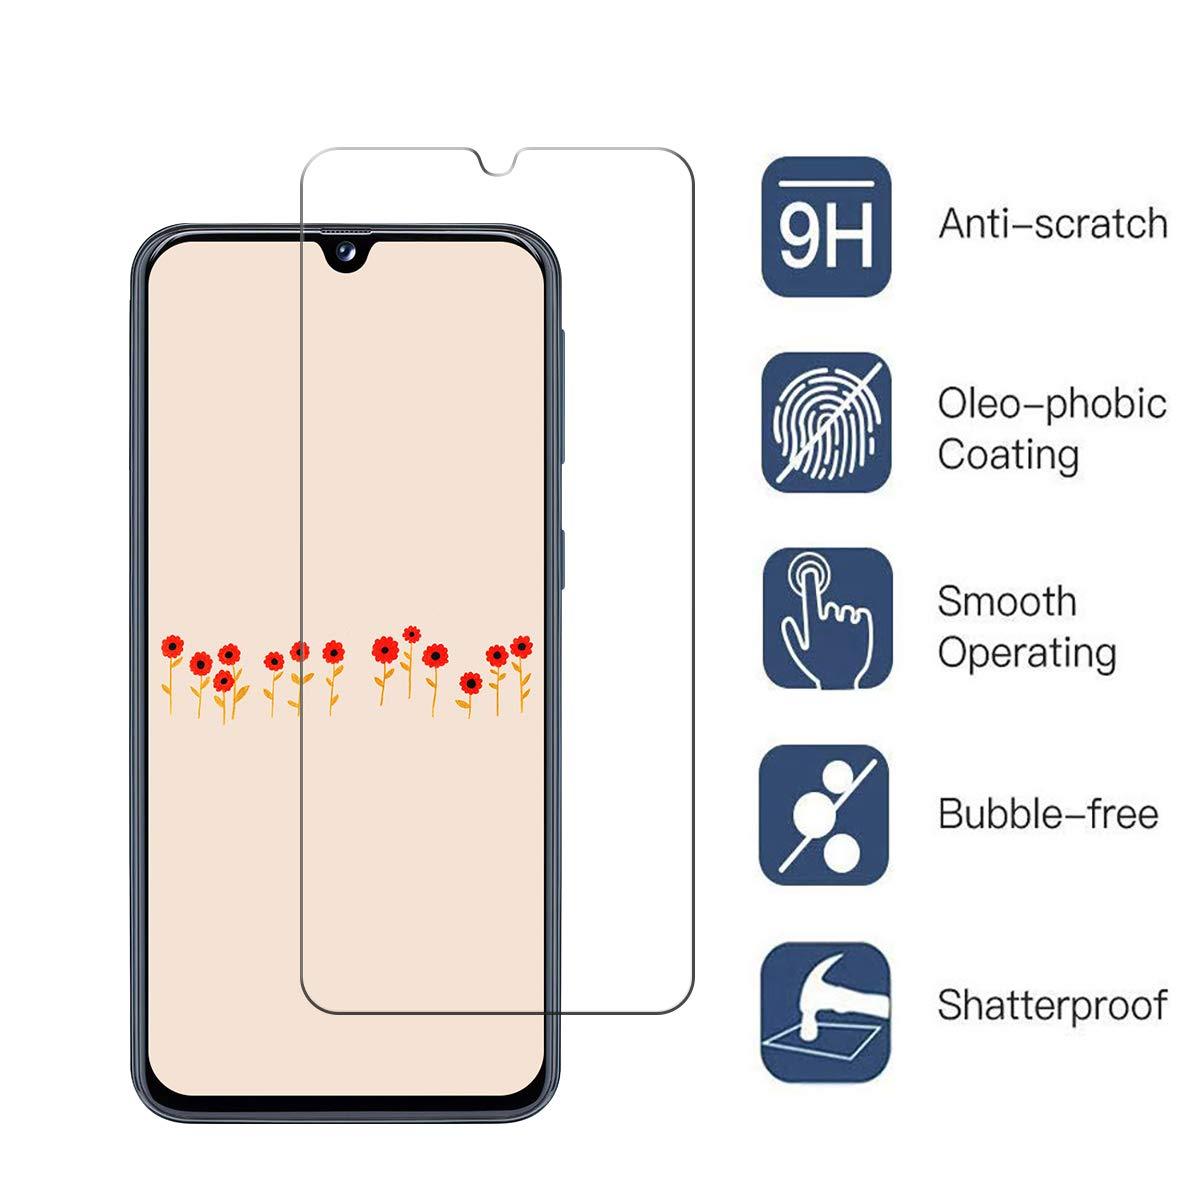 Protector Pantalla Galaxy A40 Satacnut 9H Dureza Anti-ara/ñazos Caja del tel/éfono TPU Galaxy A40,Anti-Choques 2 Piezas ,Cristal Templado Galaxy A40 Alta Definicion